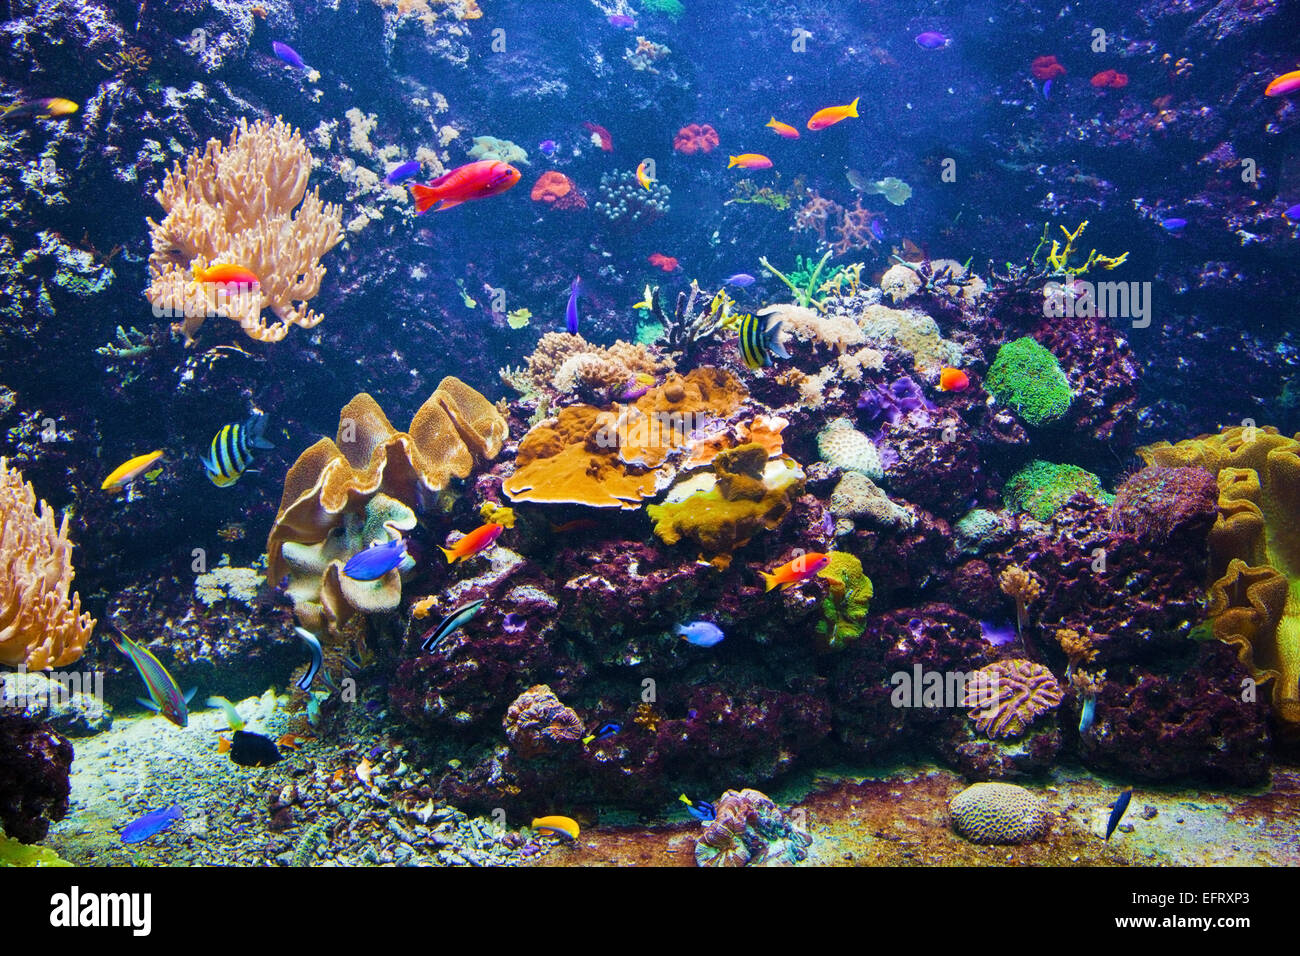 Underwater life Coral reef fish colorful plants in ocean Stock